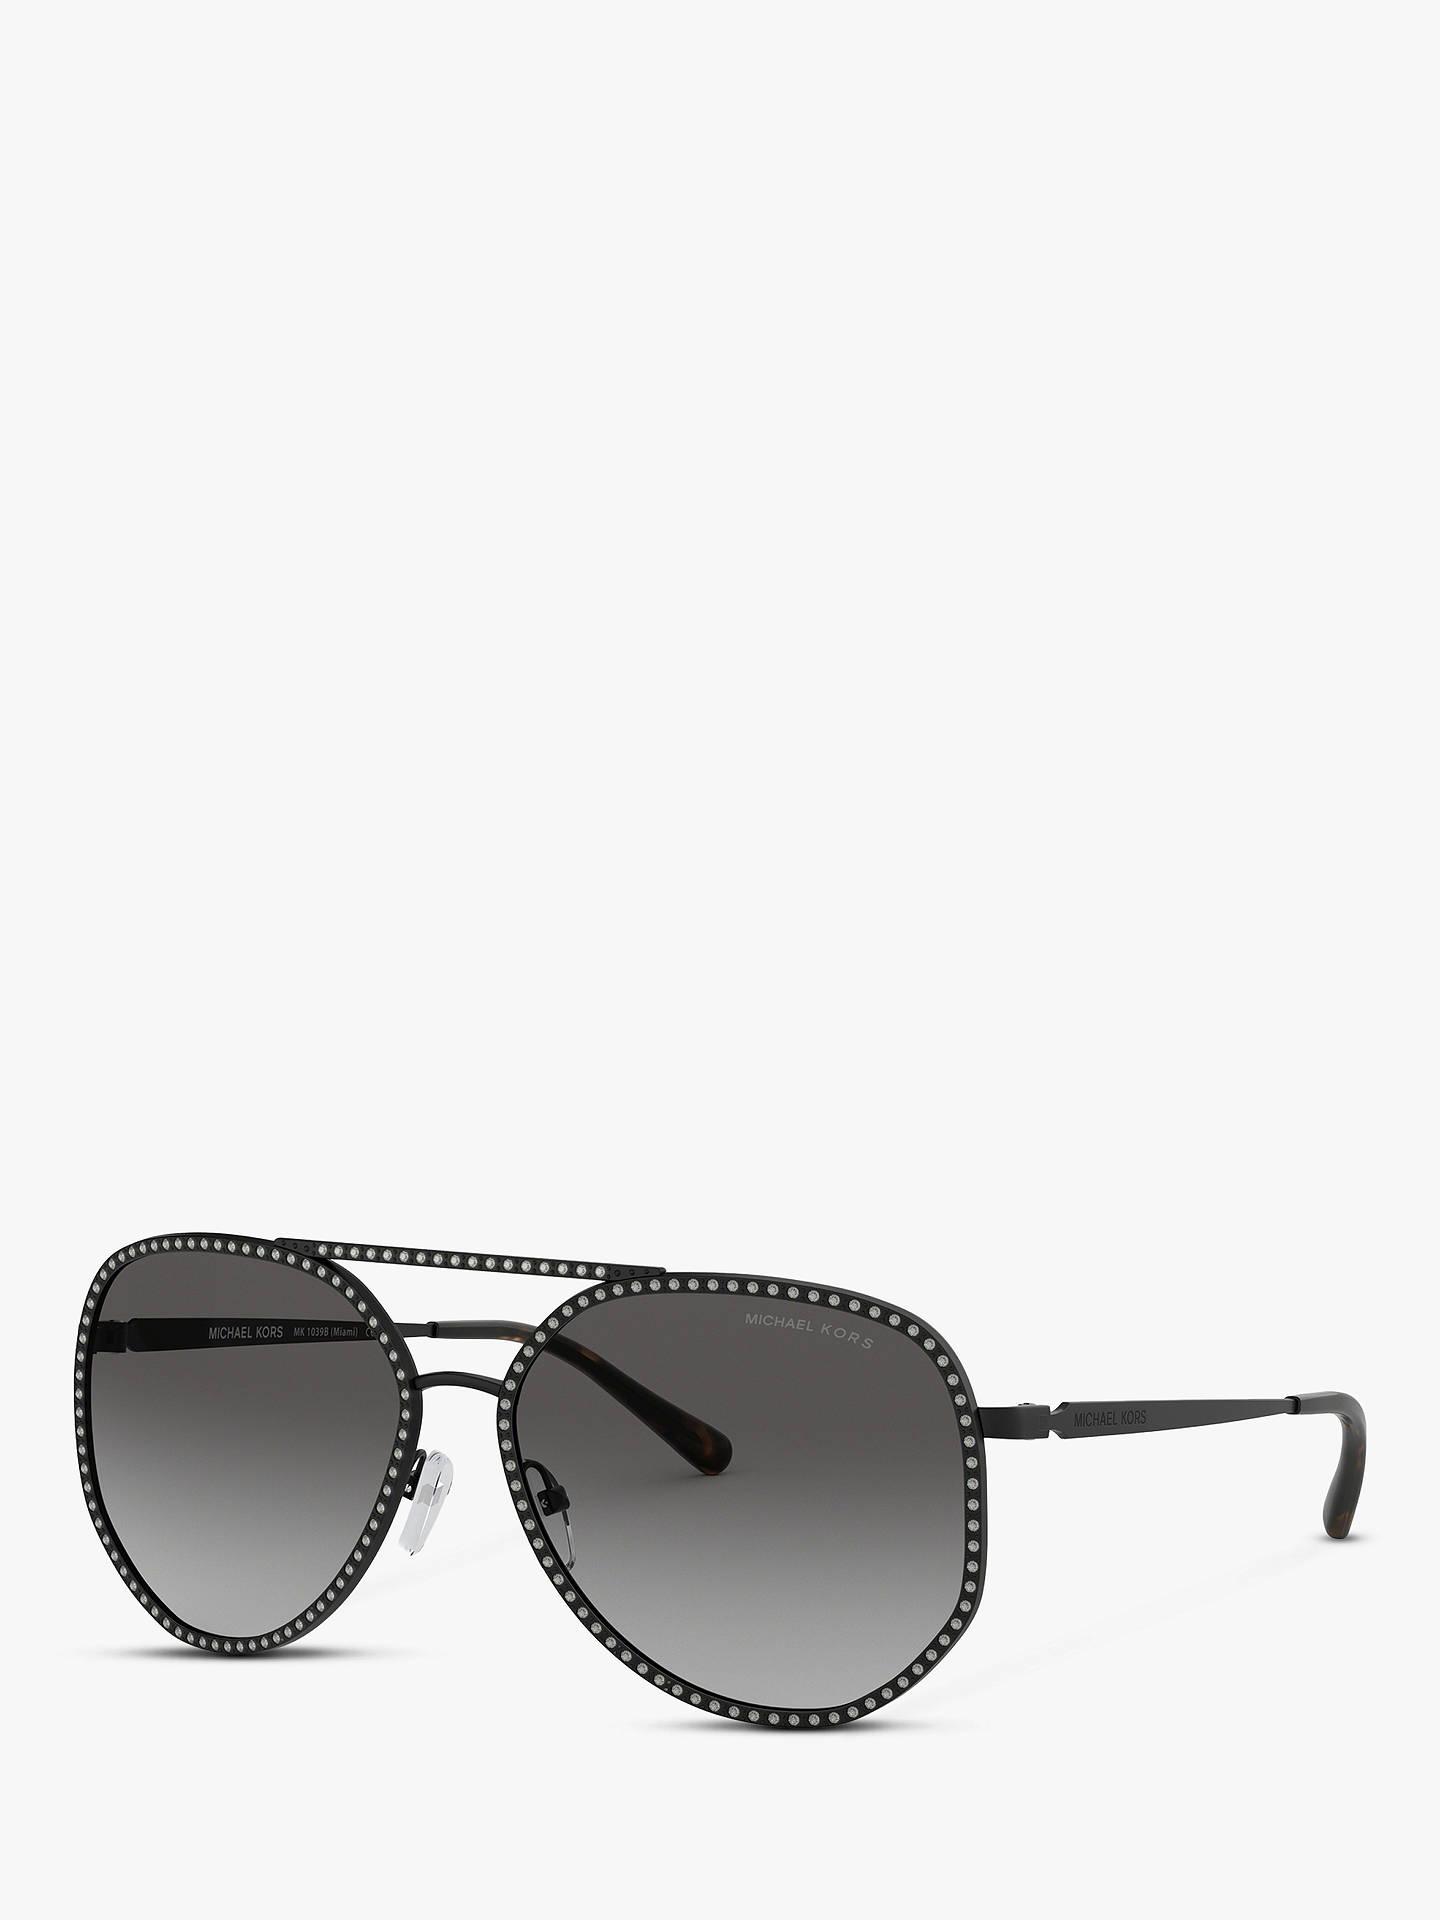 d9c7a0b2bb Buy Michael Kors MK1039B Women s Miami Sunglasses